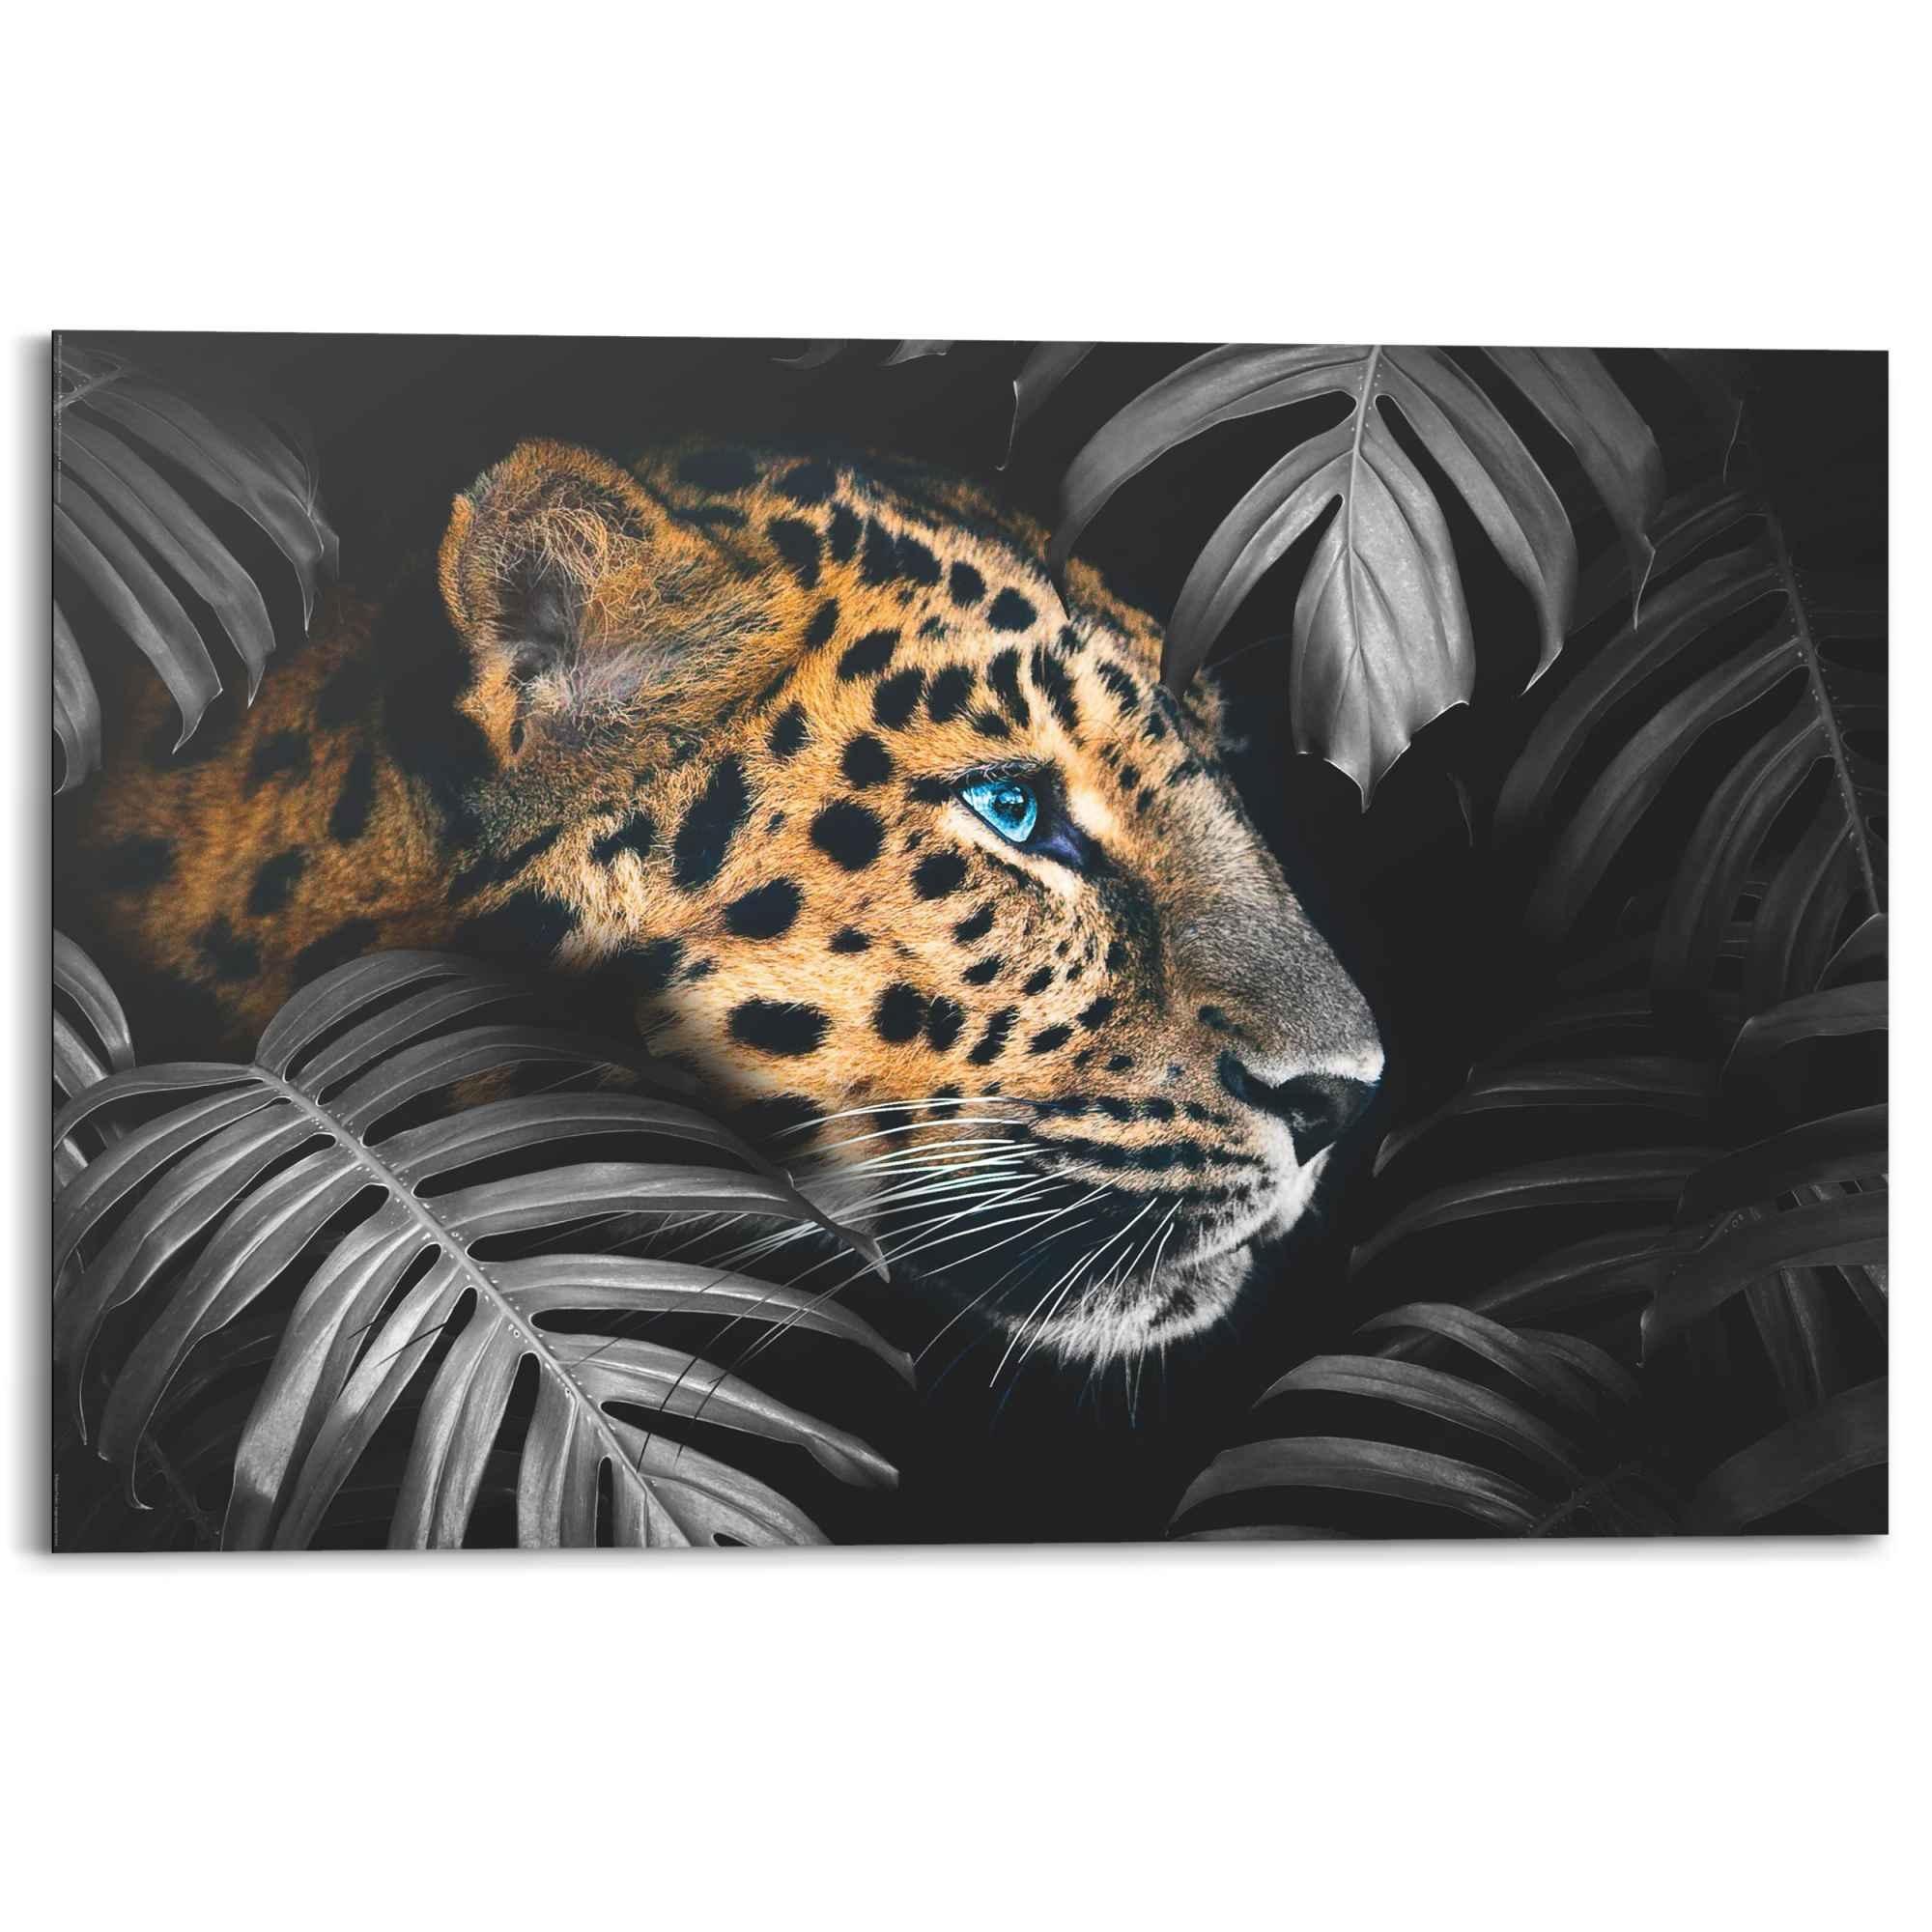 Leopard Jungle   Pflanze   Tiermotiv   Wandbild Mehrfarbig